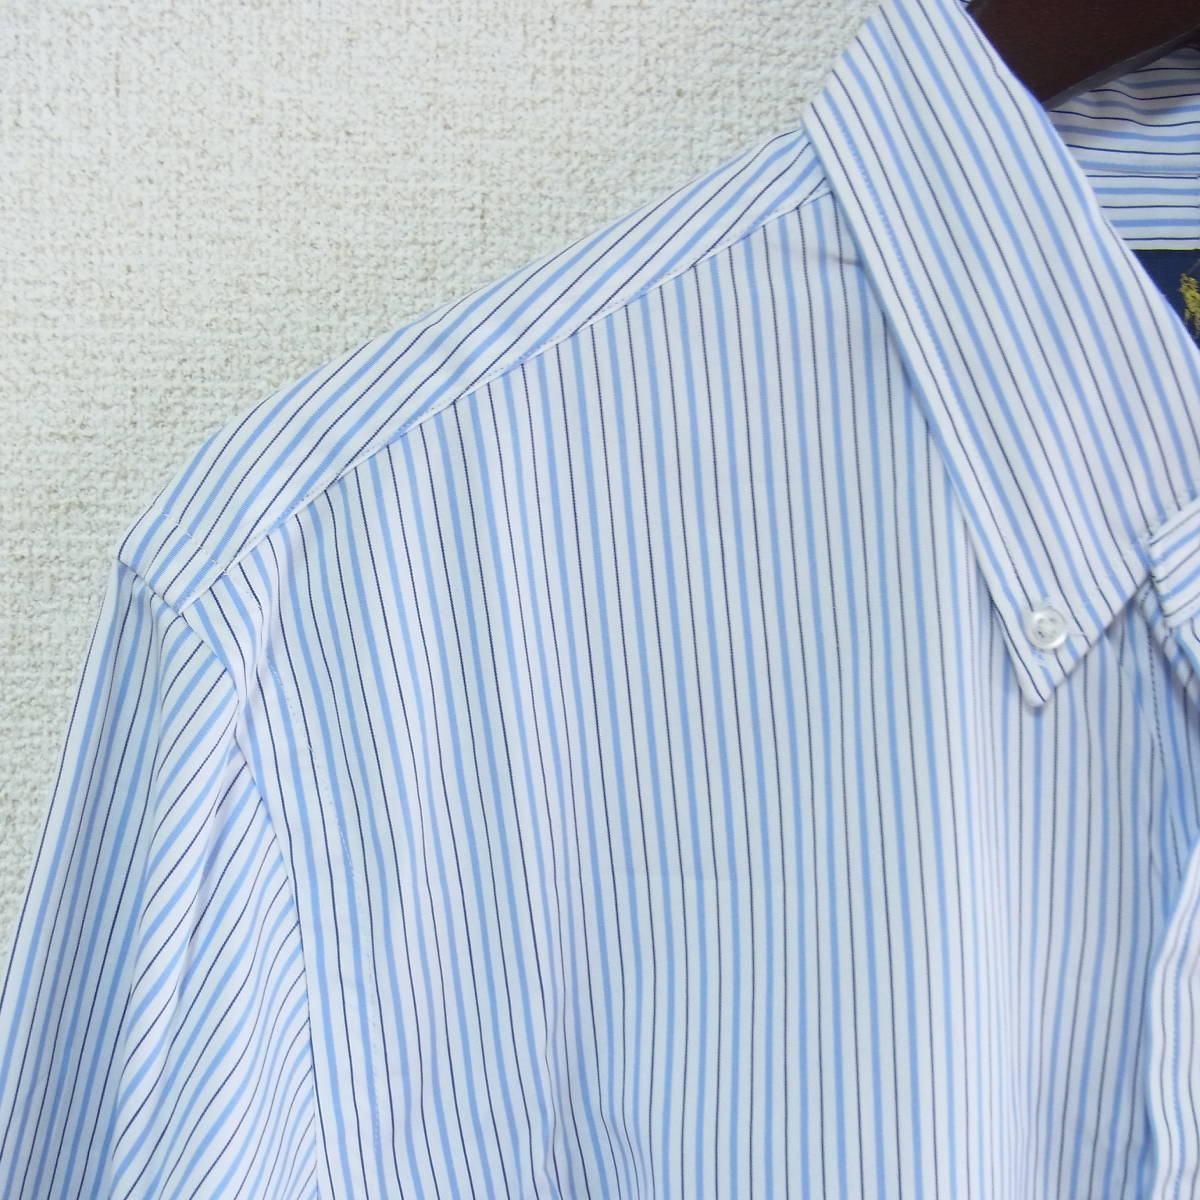 RALPH LAUREN ラルフローレン 長袖 ストライプ ボタンダウンシャツ 15-1/2(39) ライトブルー/ネイビー_画像3